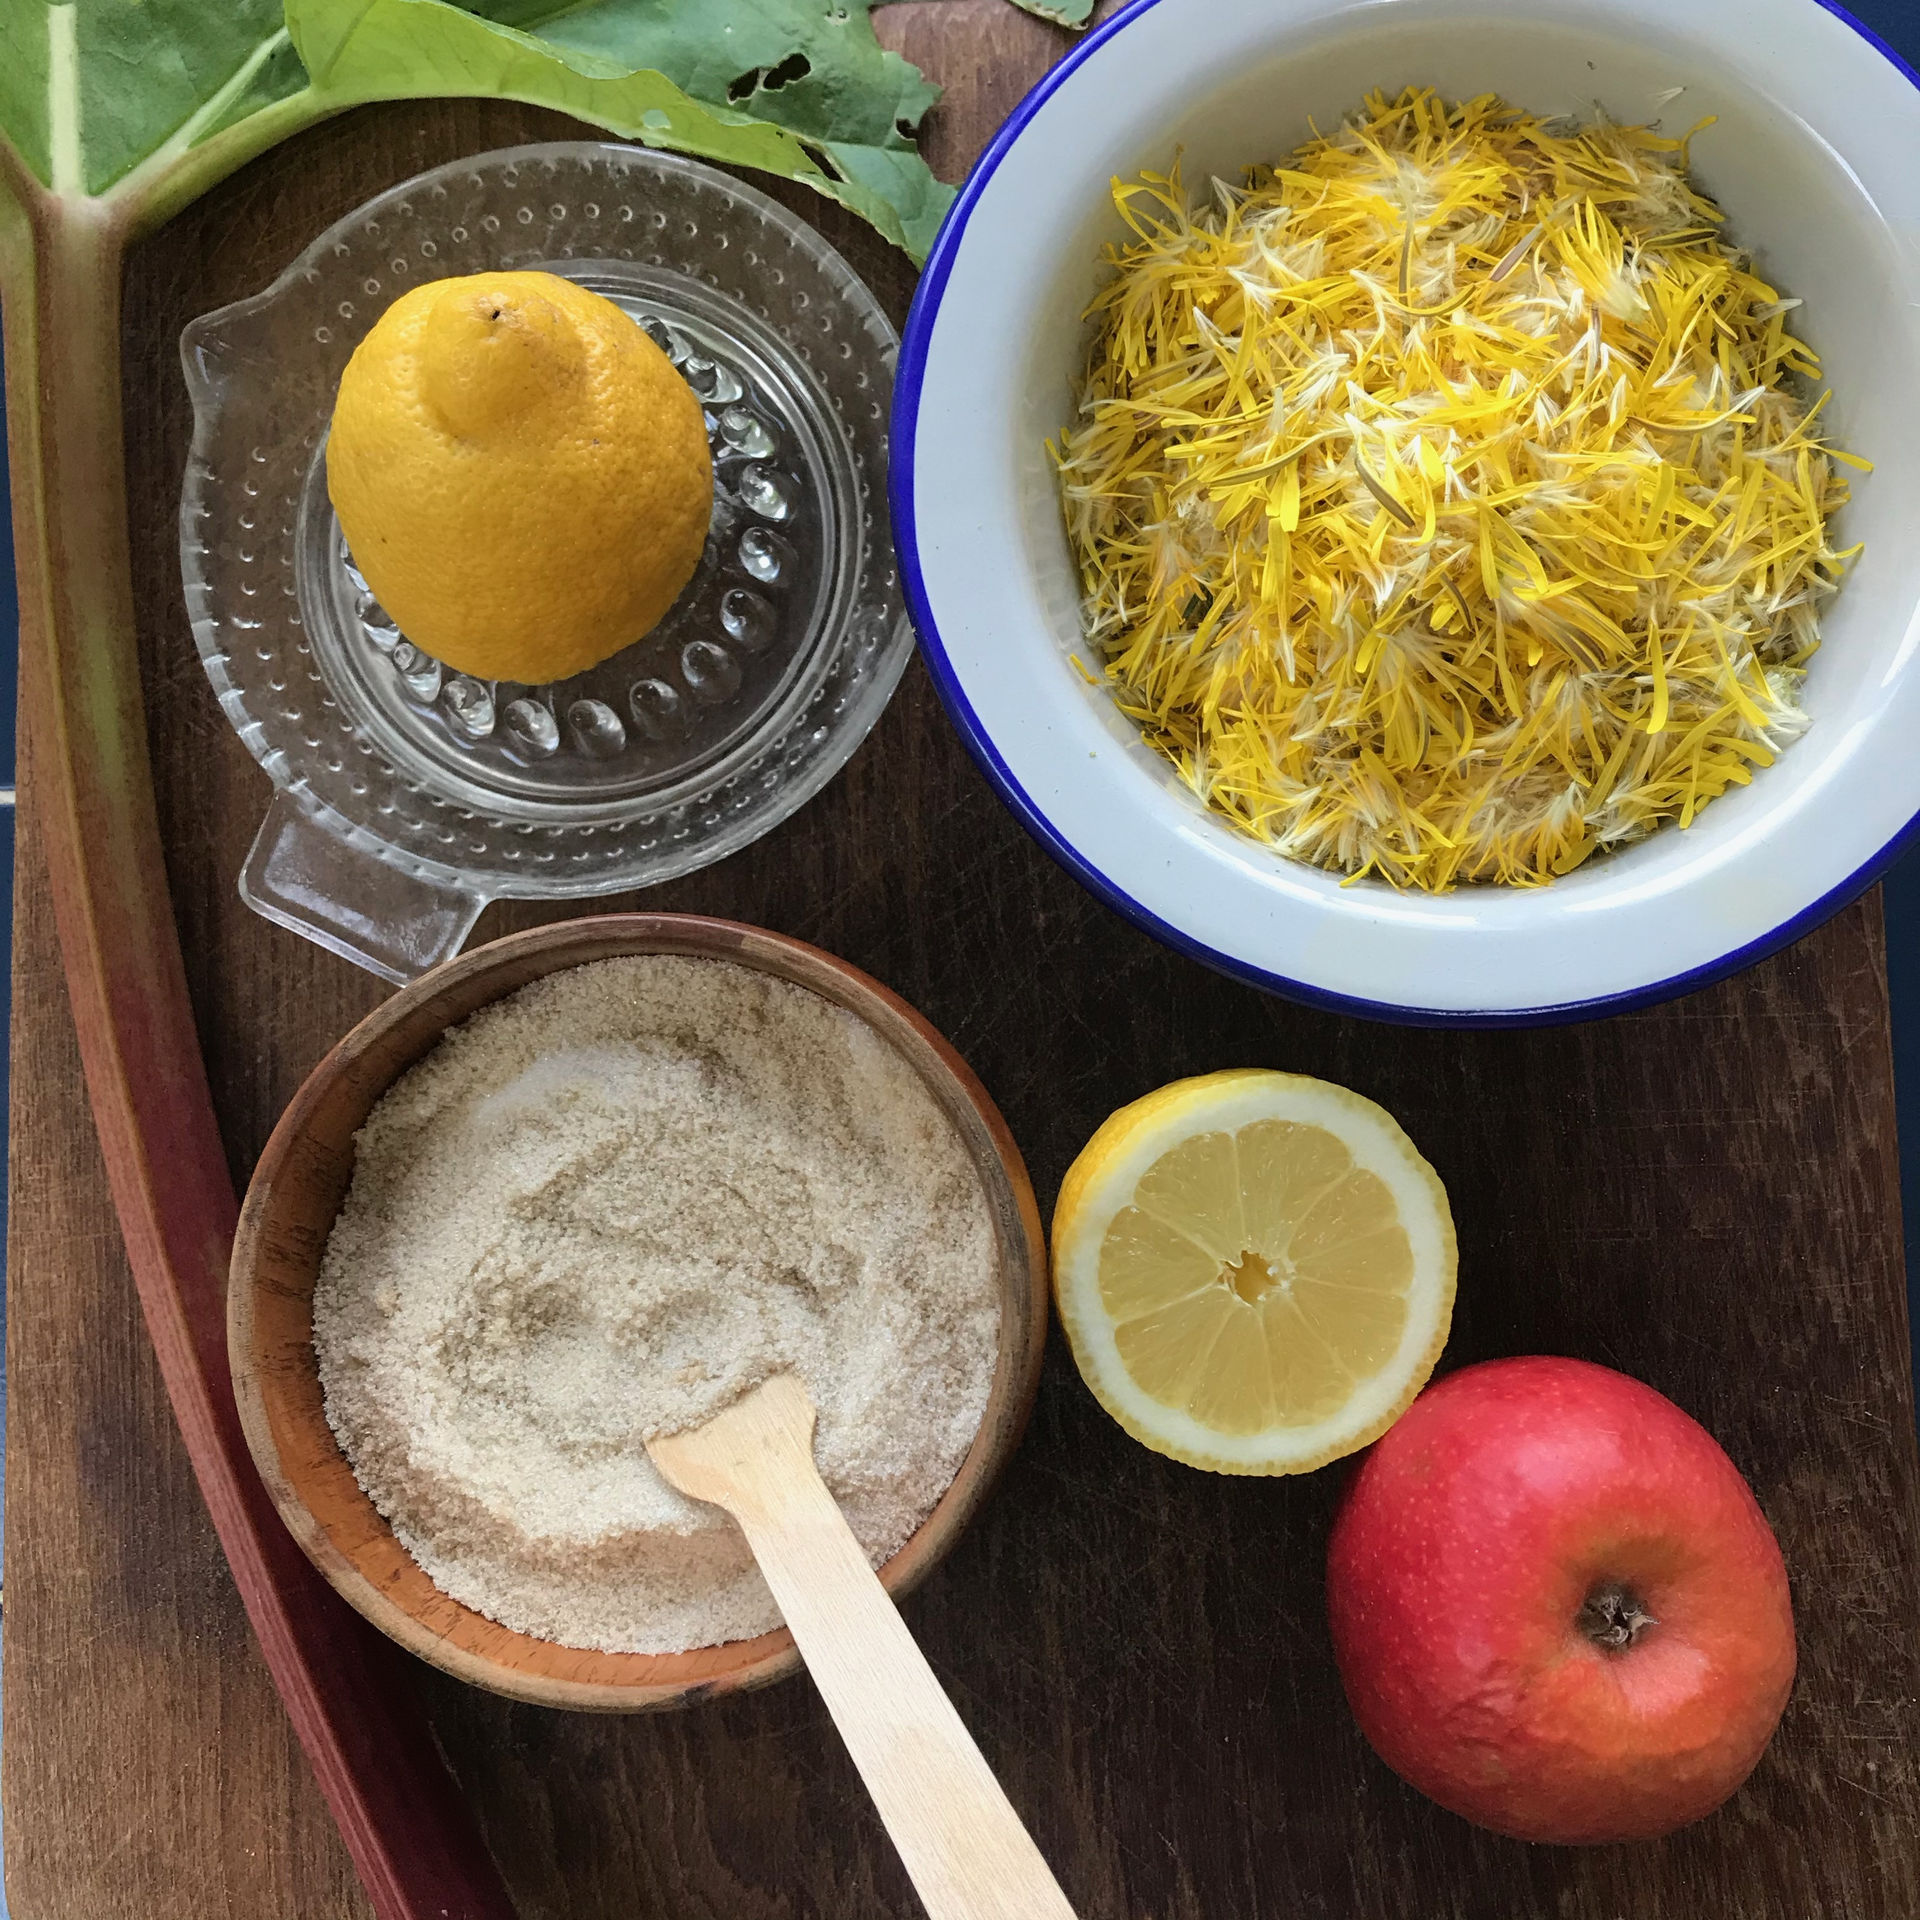 zero-waste-recipe-dandelion-syrup-img-9300.jpg